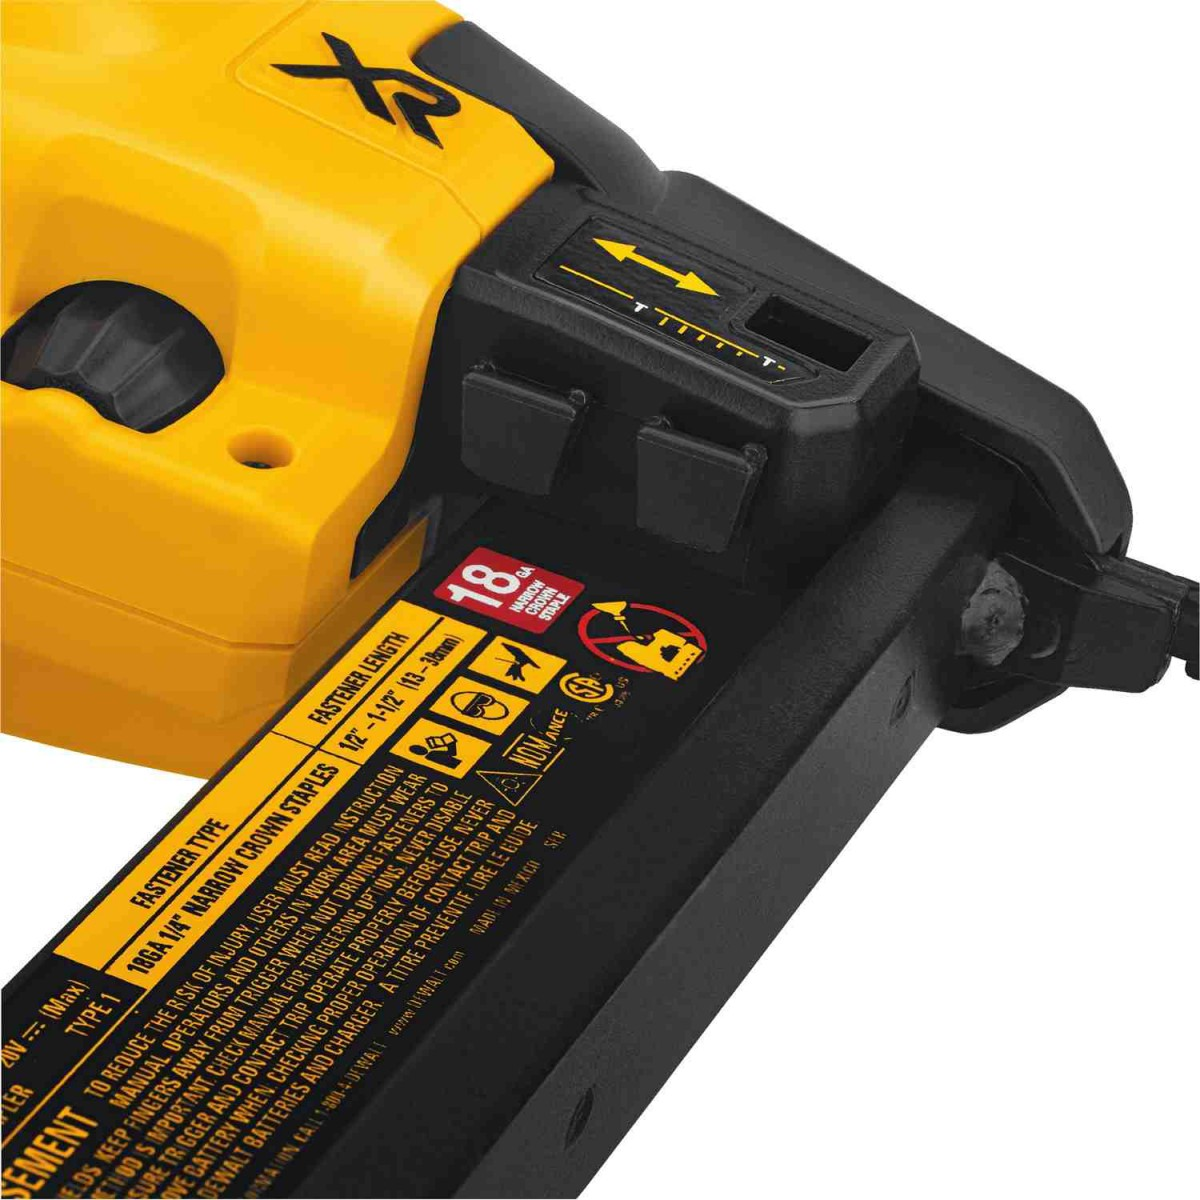 Dewalt DCN681D1  20V Max XR 18 Ga Narrow Crown Stapler Kit with 2.0Ah Battery